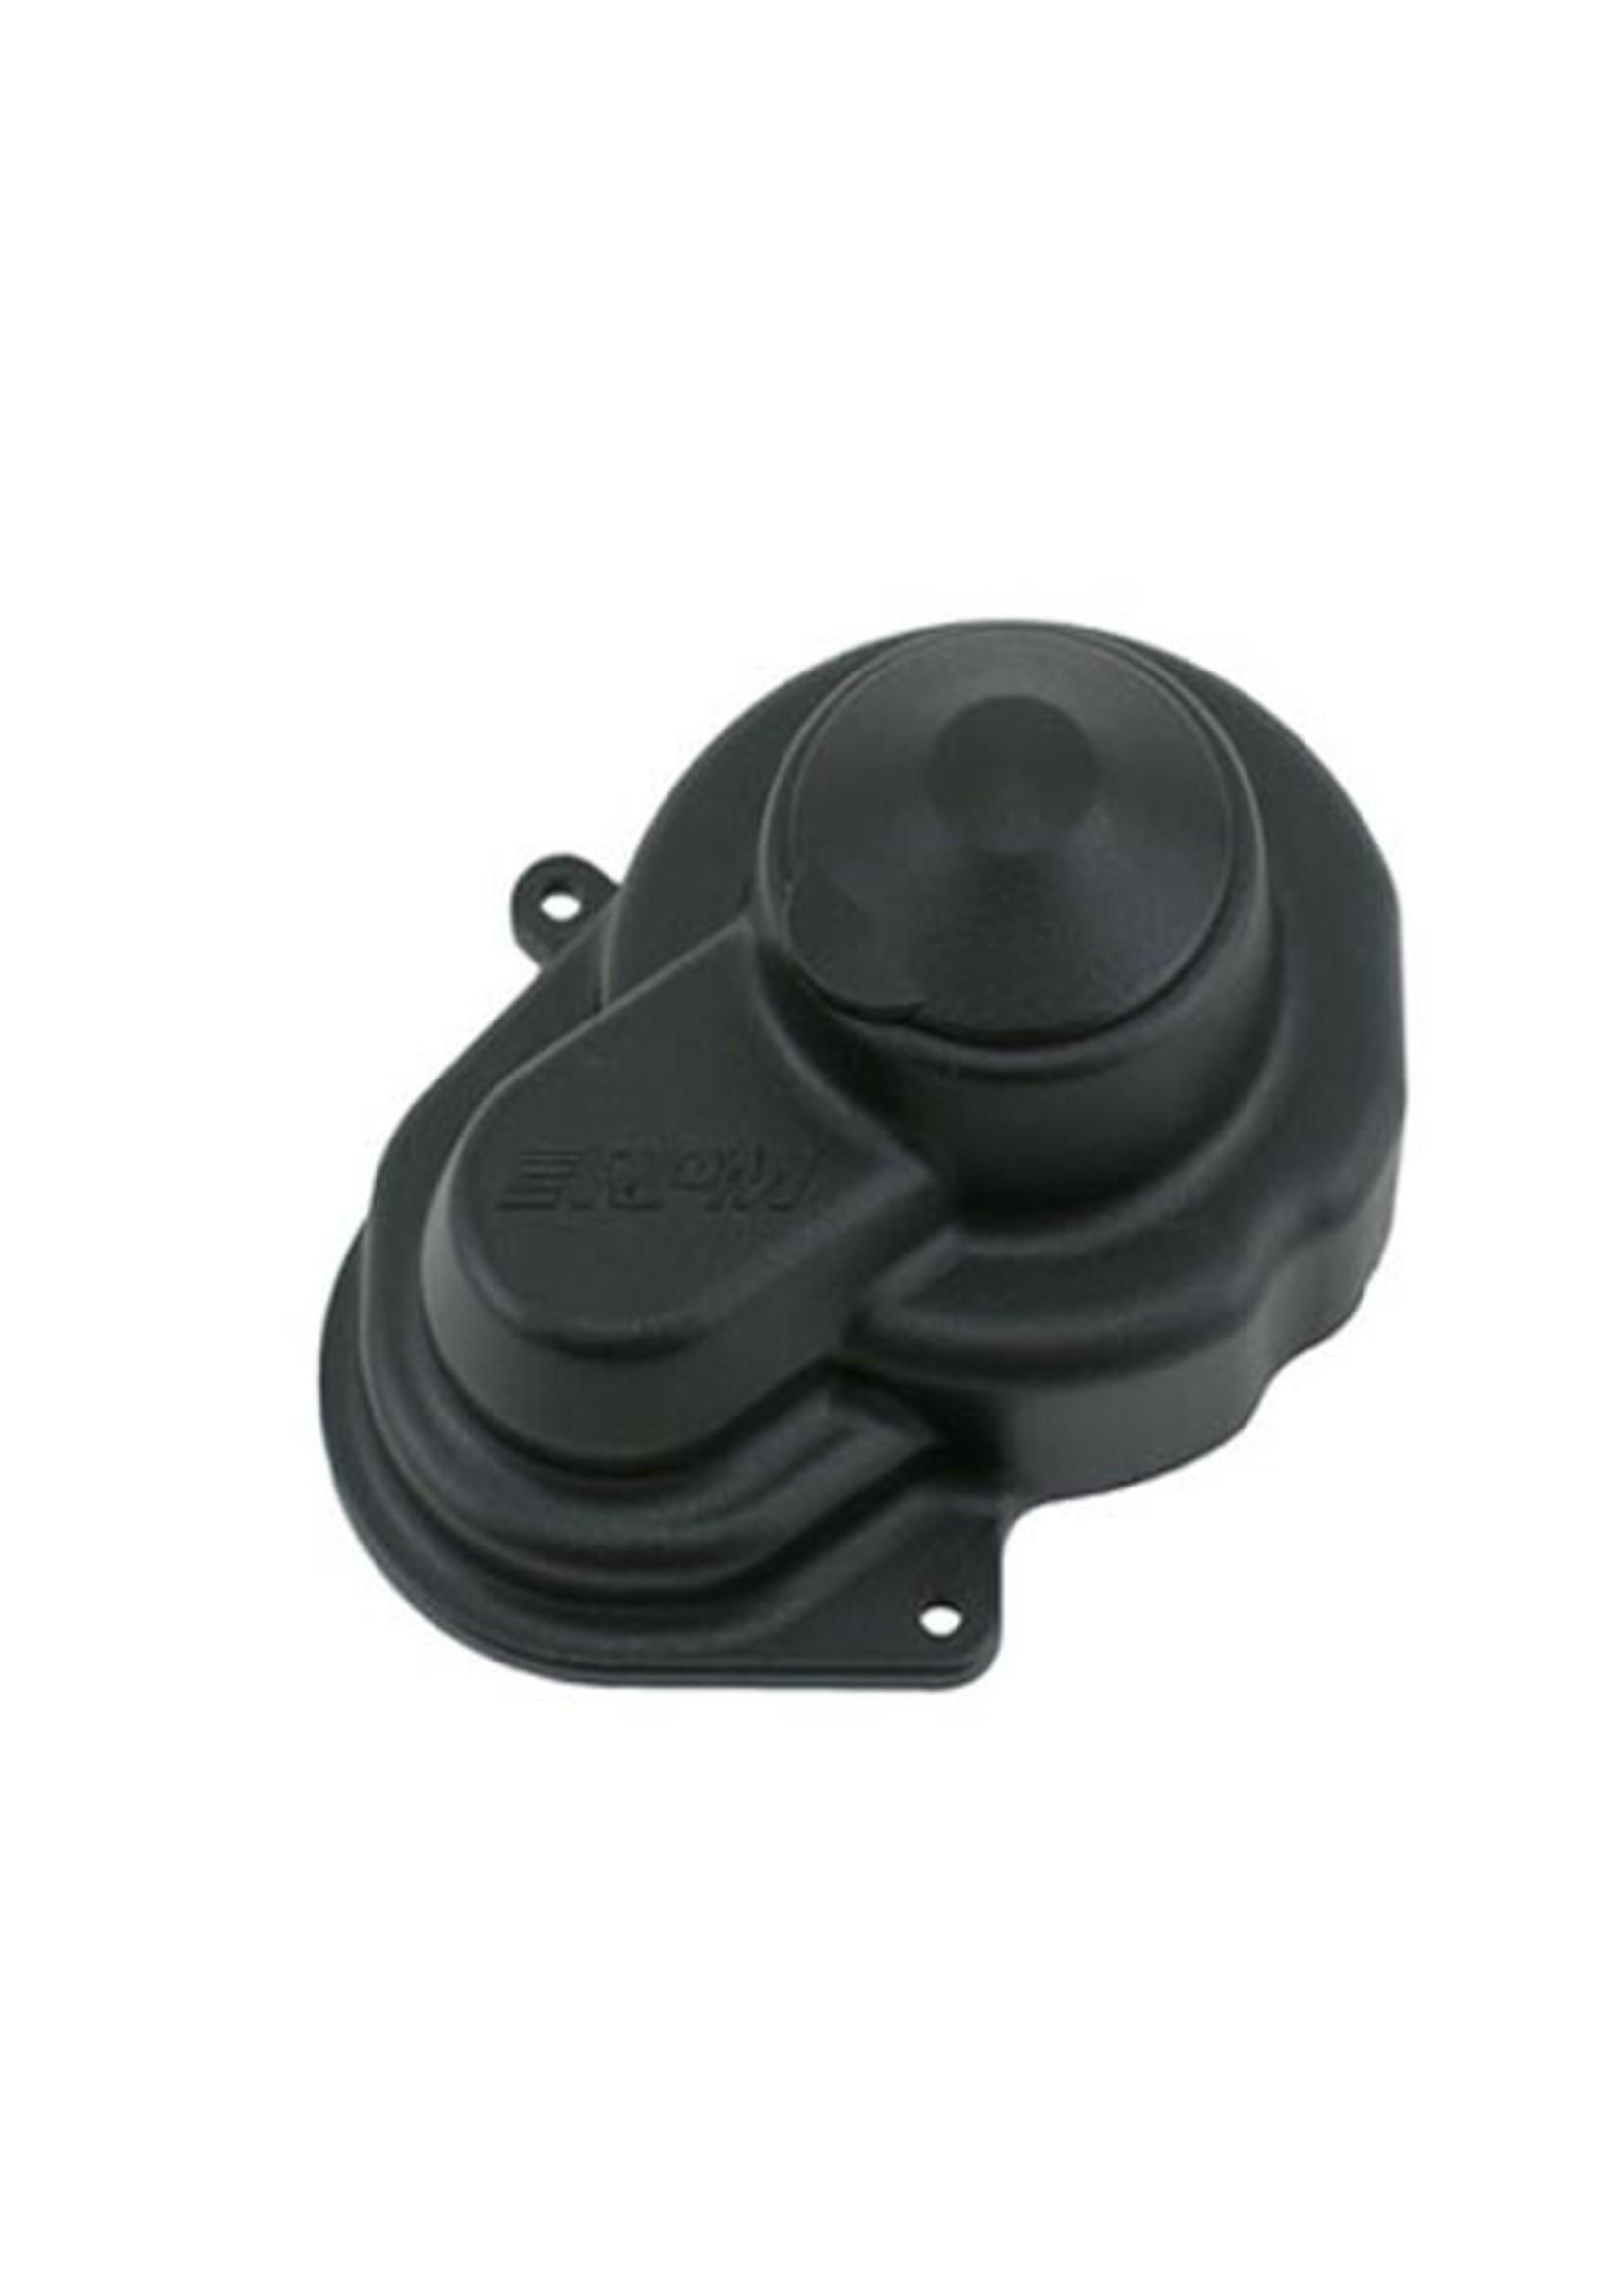 RPM RPM80522 RPM Sealed Gear Cover, for Traxxas e-Rustler/Stampede 2wd/Bandit/Slash, Black